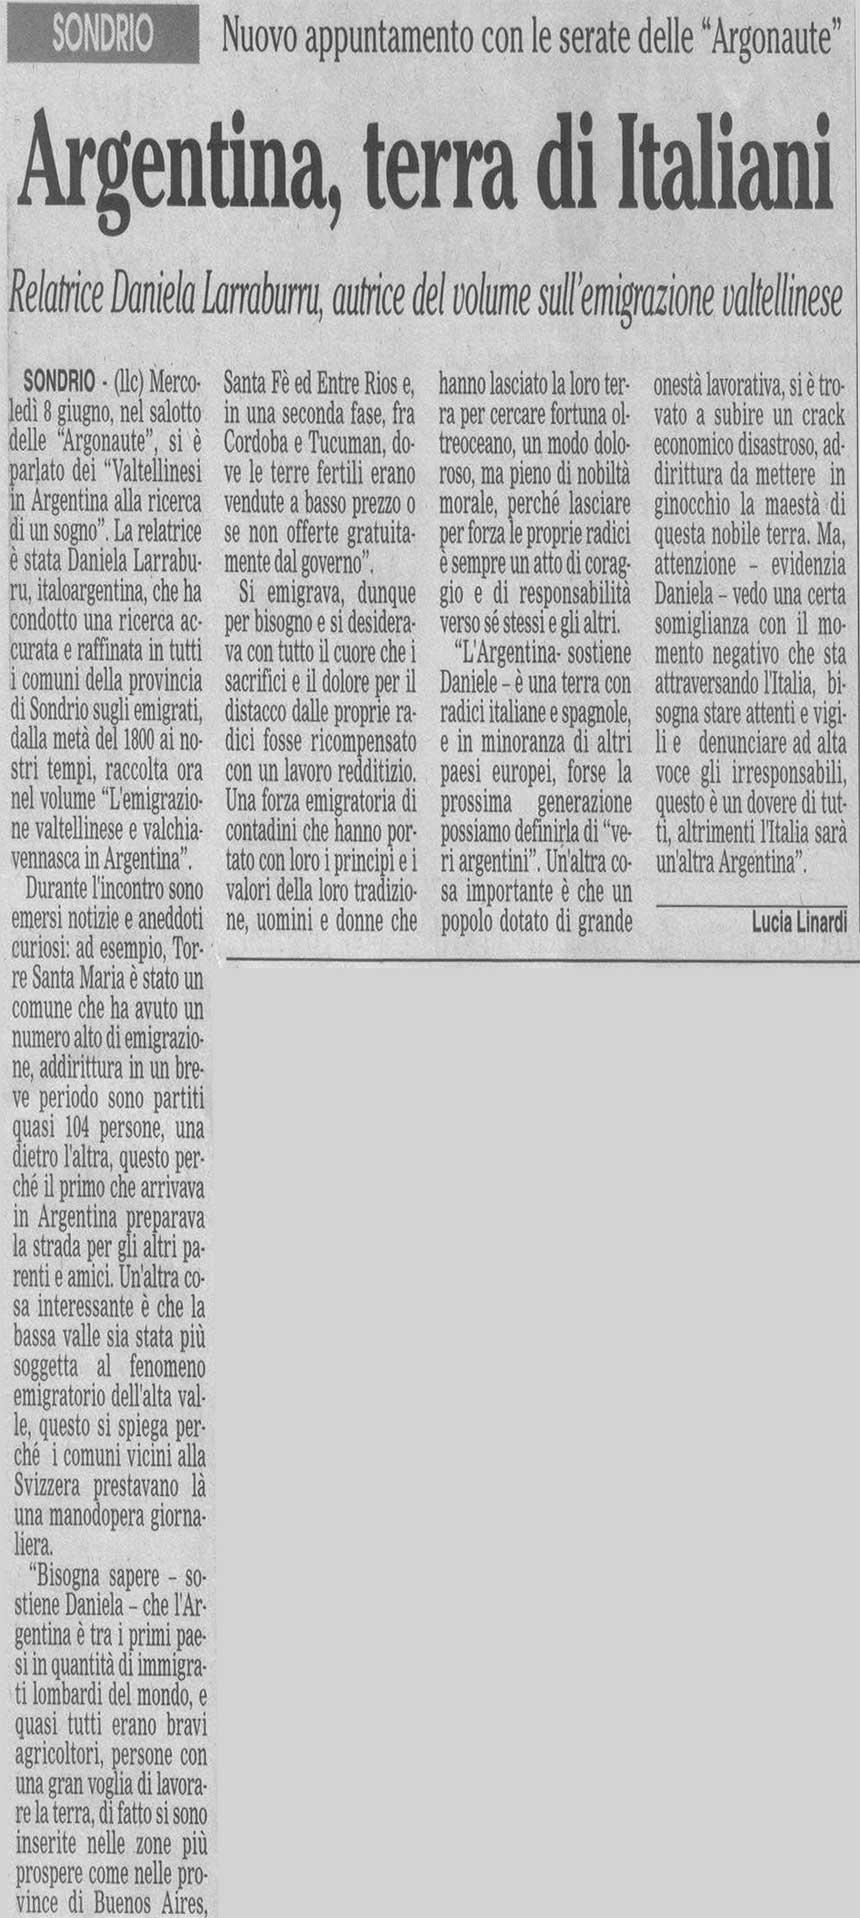 2005-06-08 Argentina, terra di Italiani